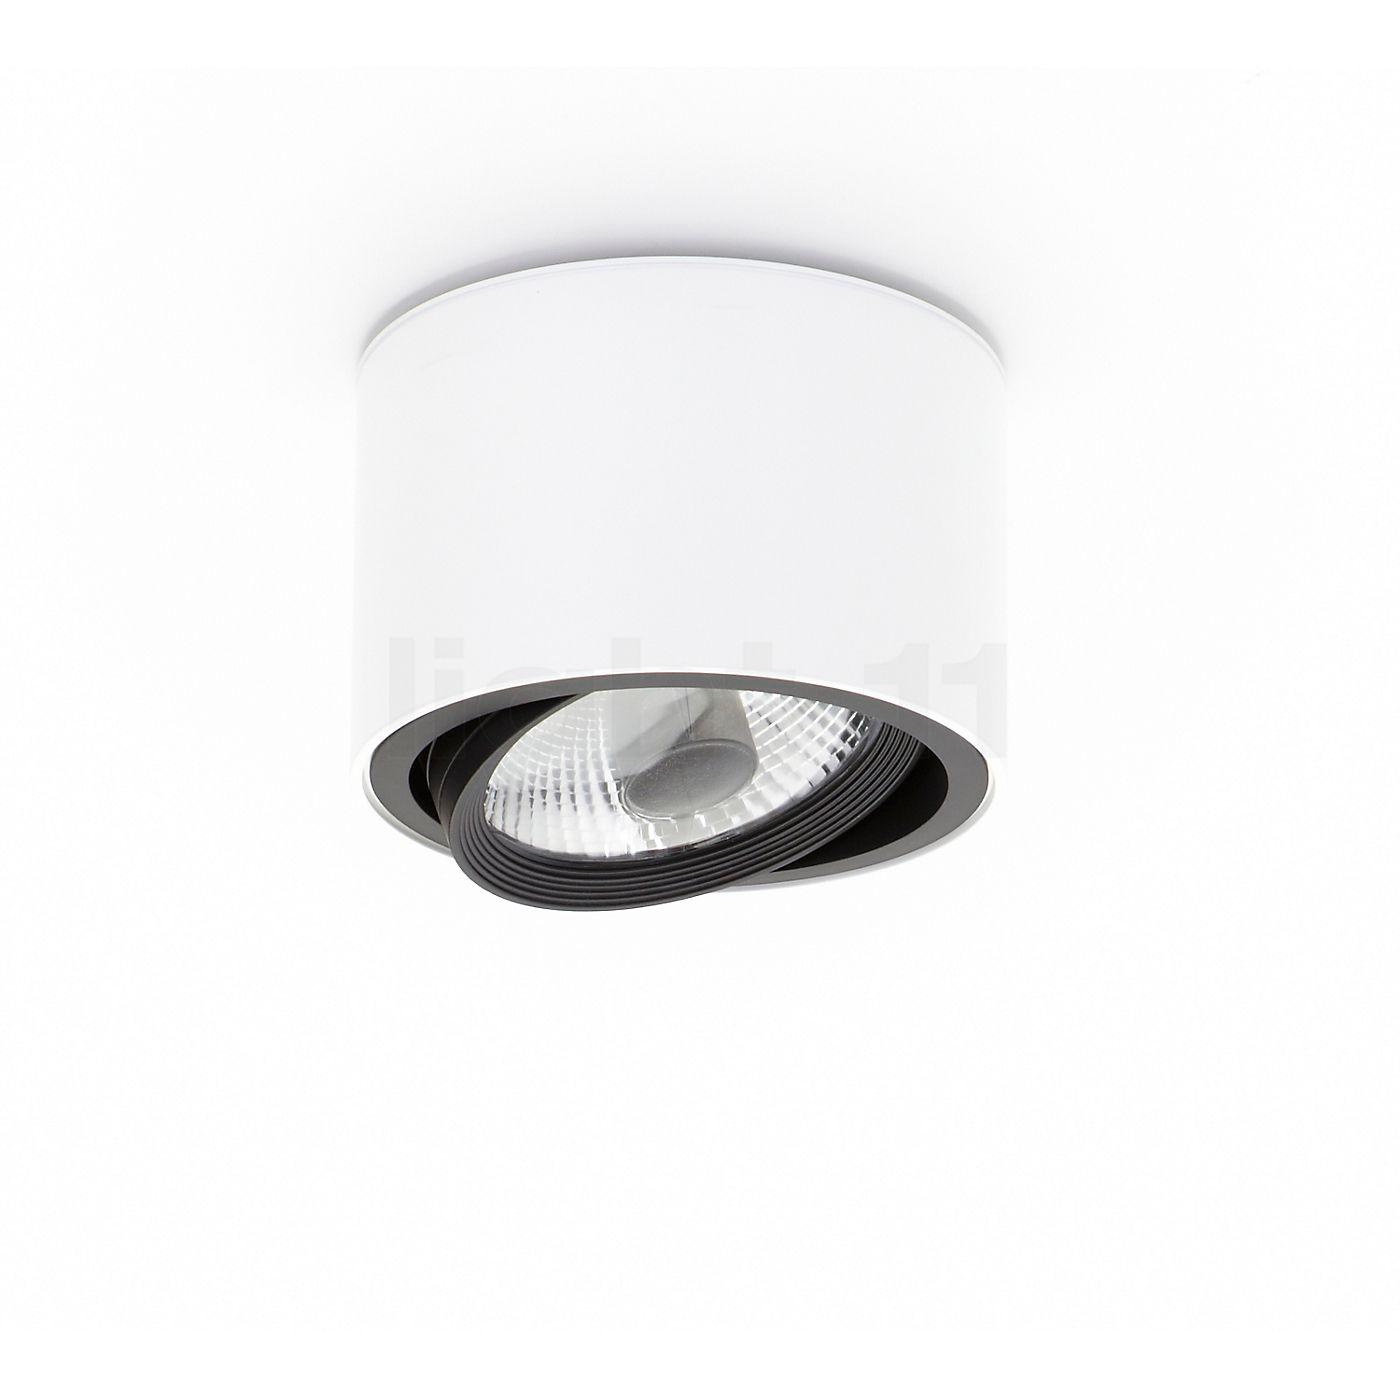 Mawa Design 111er Ronde Plafondlamp Hv Mawa Design Boutique